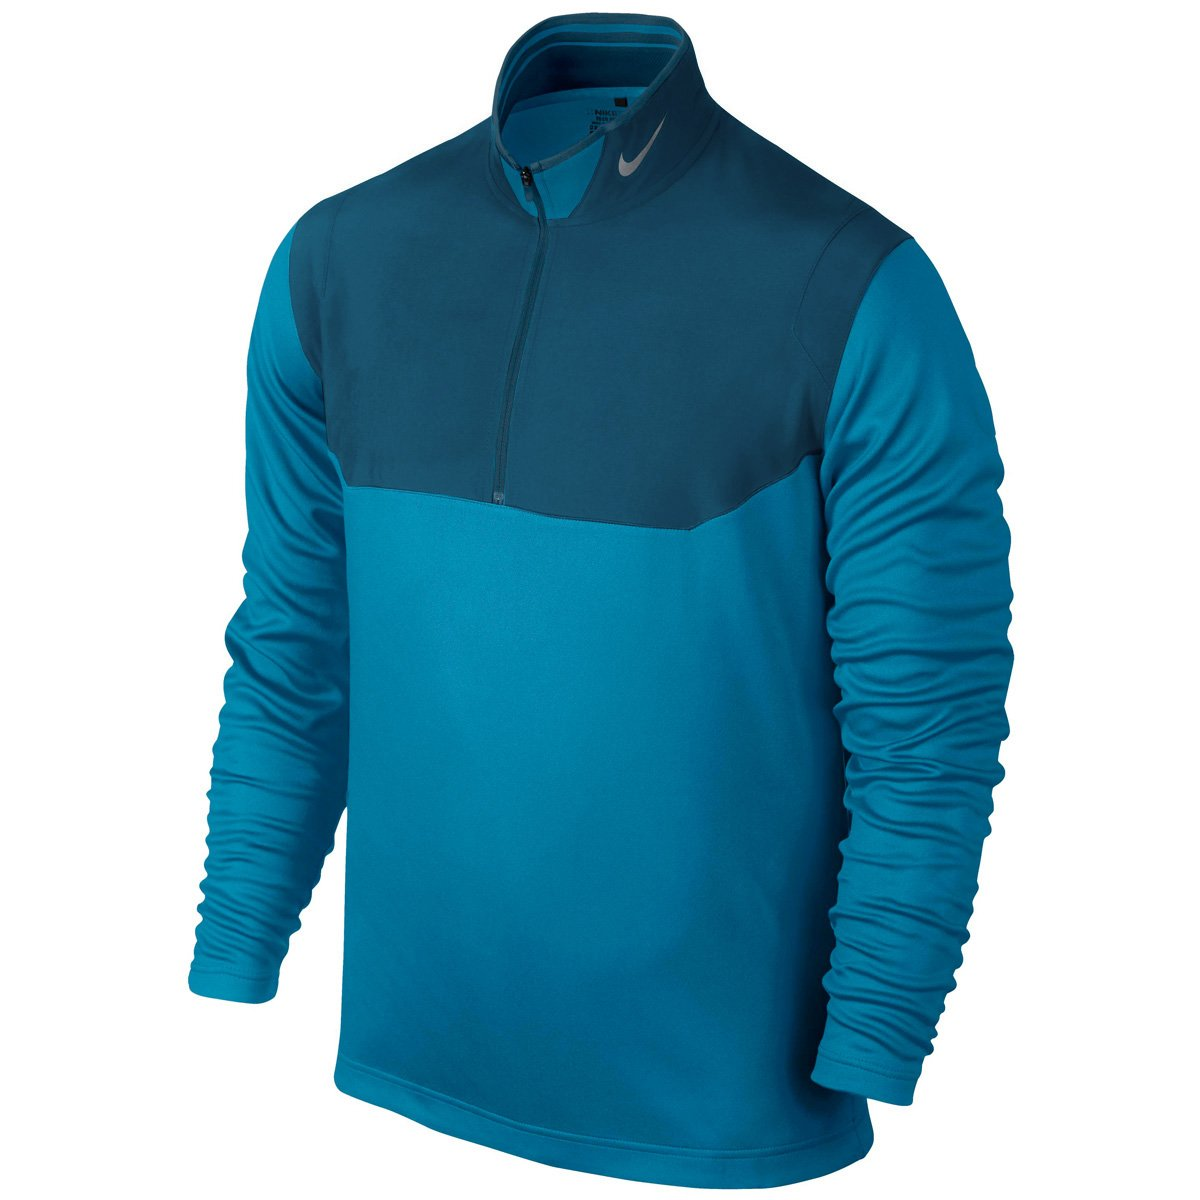 - Light blue Laque M Nike Long-Sleeved Jersey 1 2 zip for Men Royal Deep bluee Deep Royal bluee Photo Wolf bluee